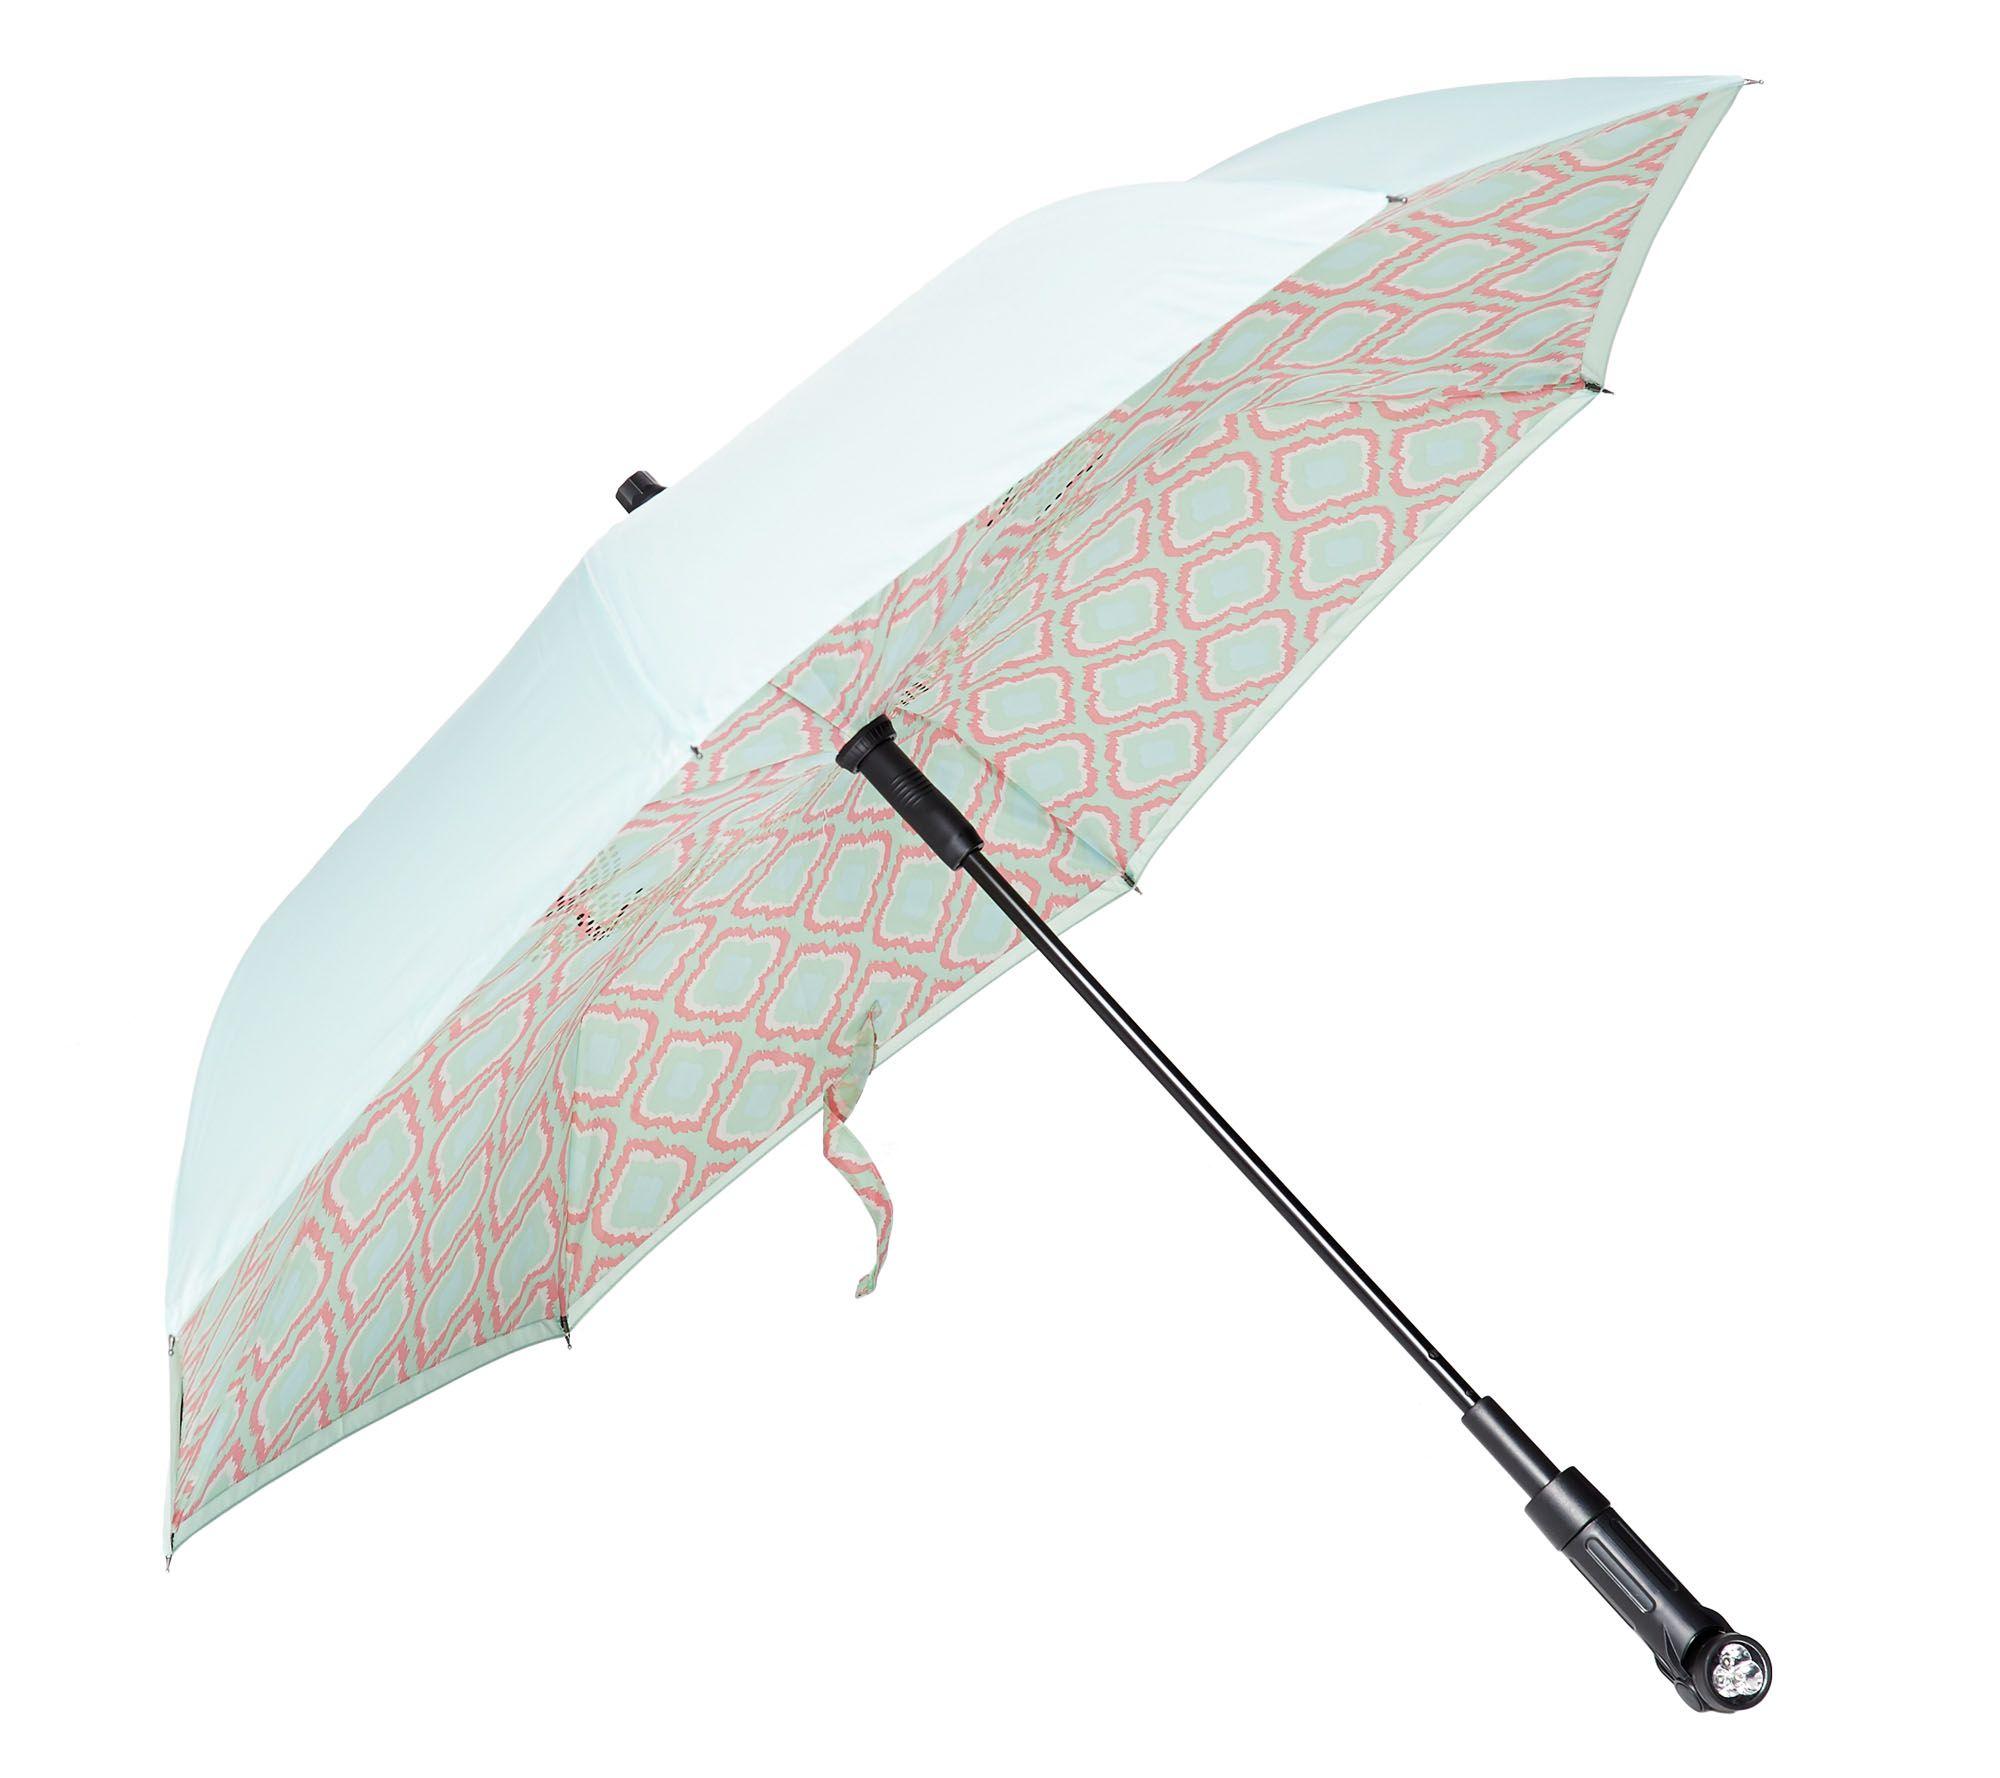 79c13b961aaa Revers-A-Brella Double Layer Inverted Automatic Open Umbrella w/ Lig —  QVC.com